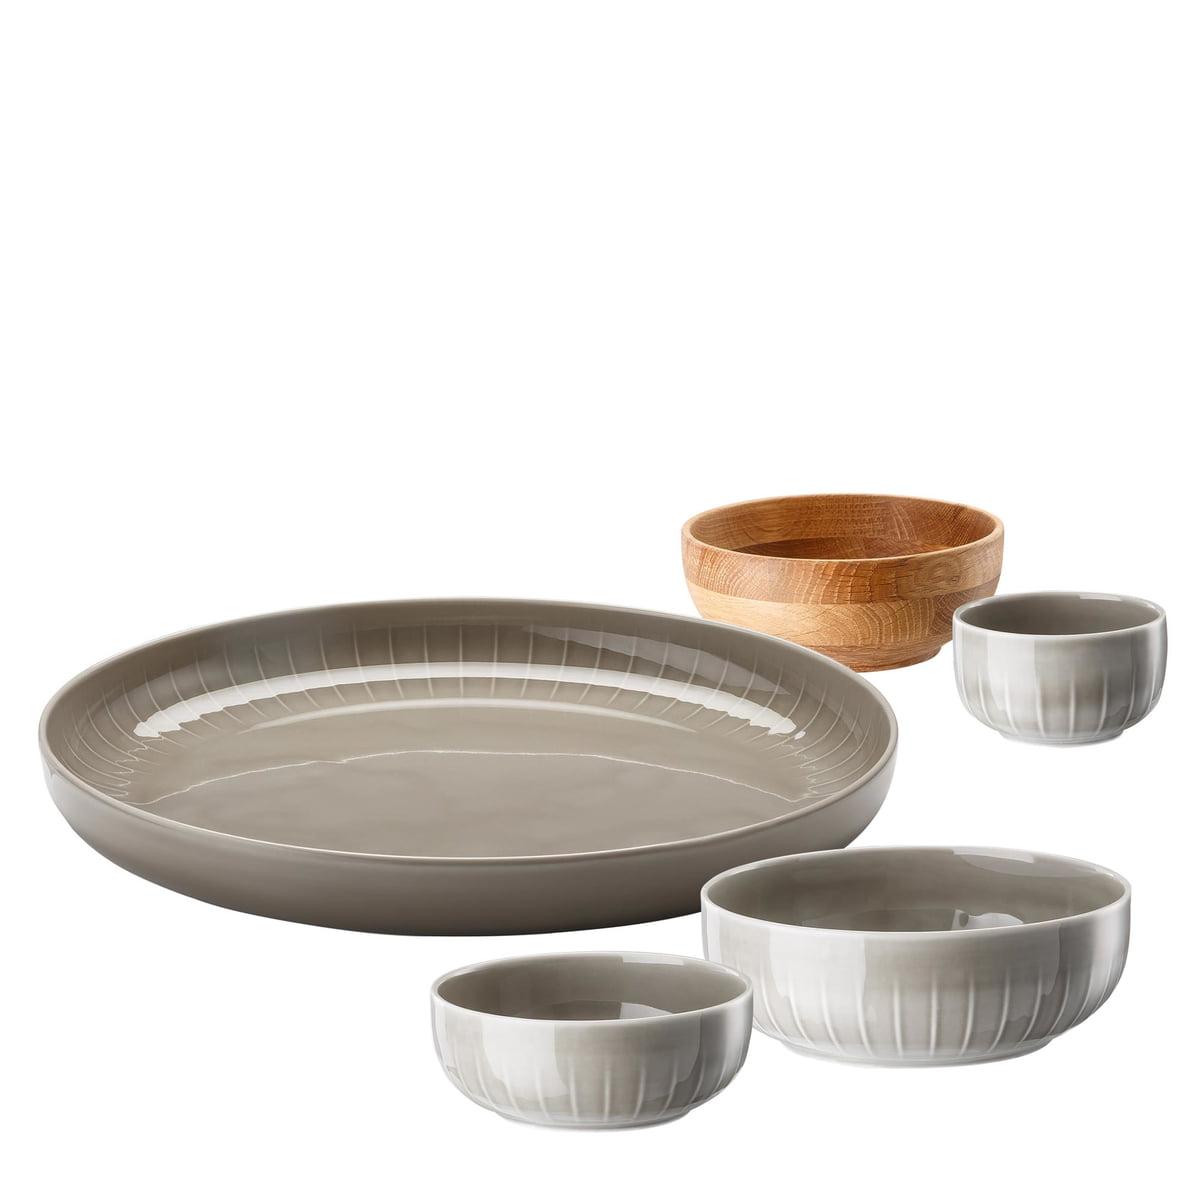 Arzberg - Joyn Dinnerware Set (5 pcs) in Grey  sc 1 st  Connox & Joyn Dinnerware Set Grey by Arzberg | Connox